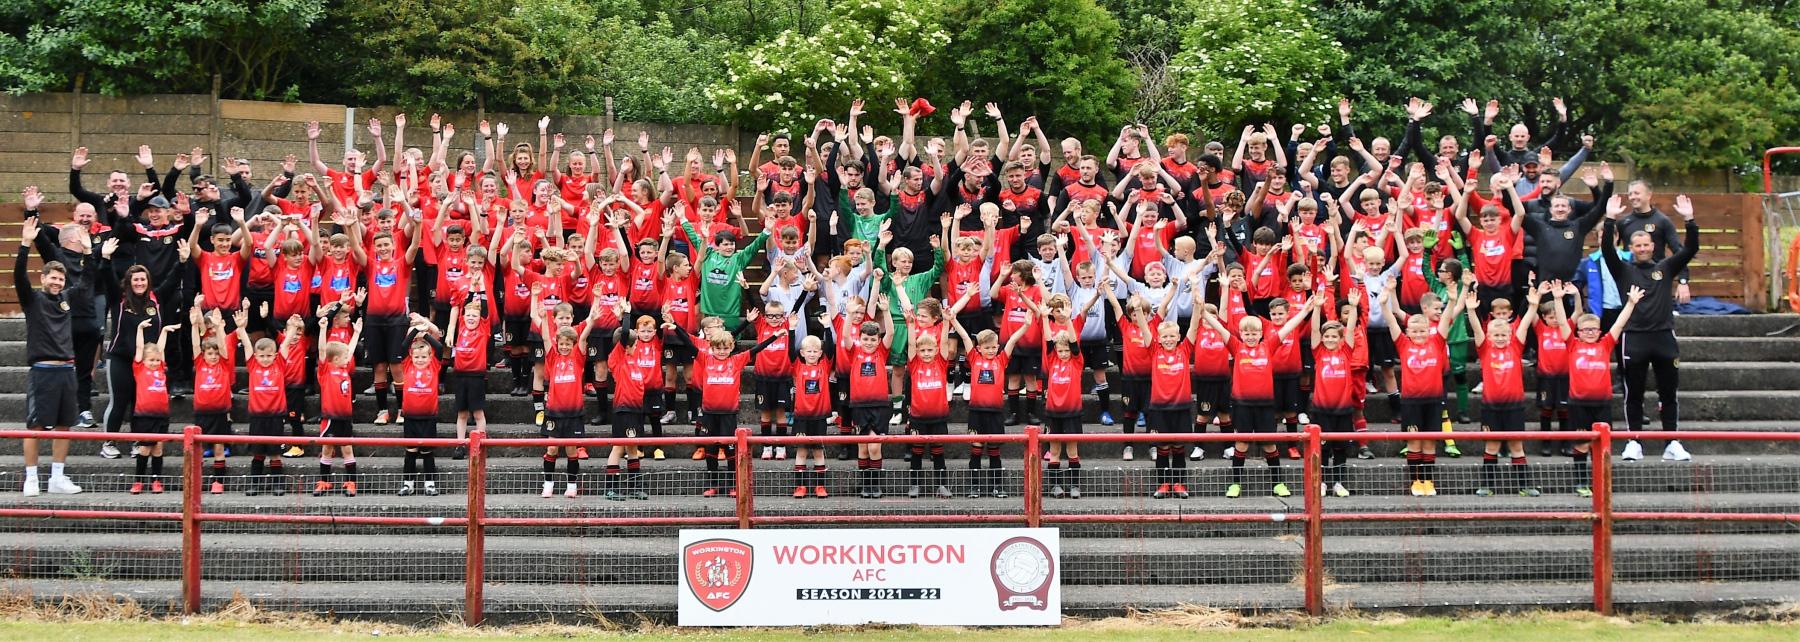 Reds Festival of Football – the Reds Football Family